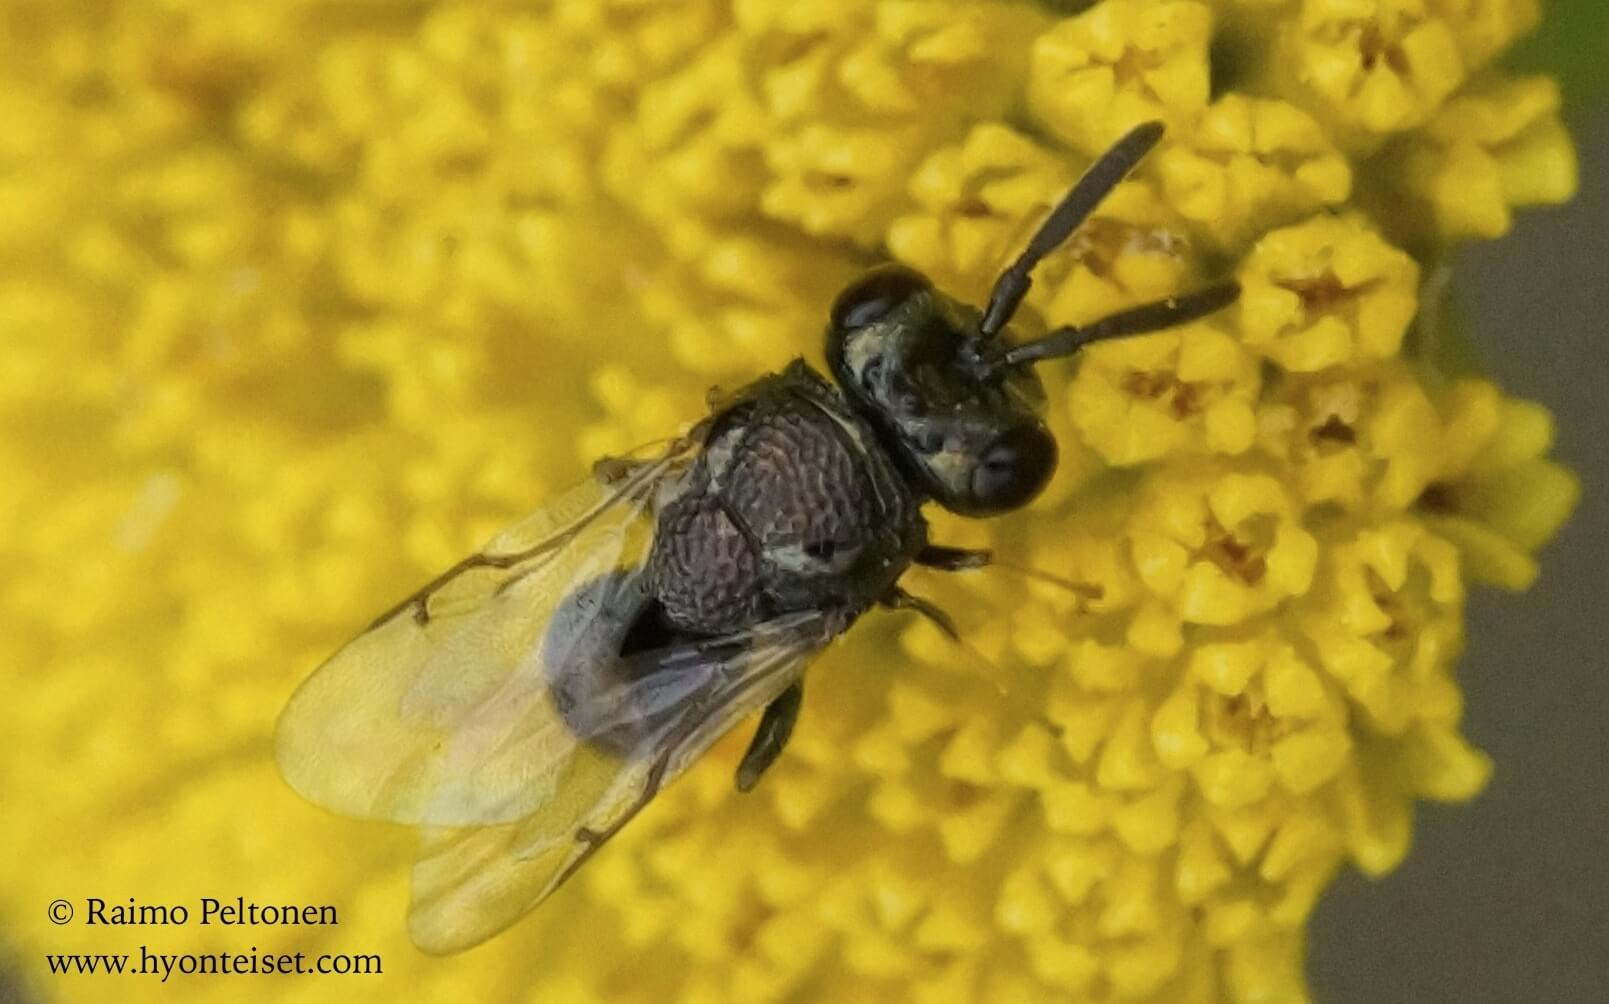 Chalcidoidae sp. (det. Juho Paukkunen)